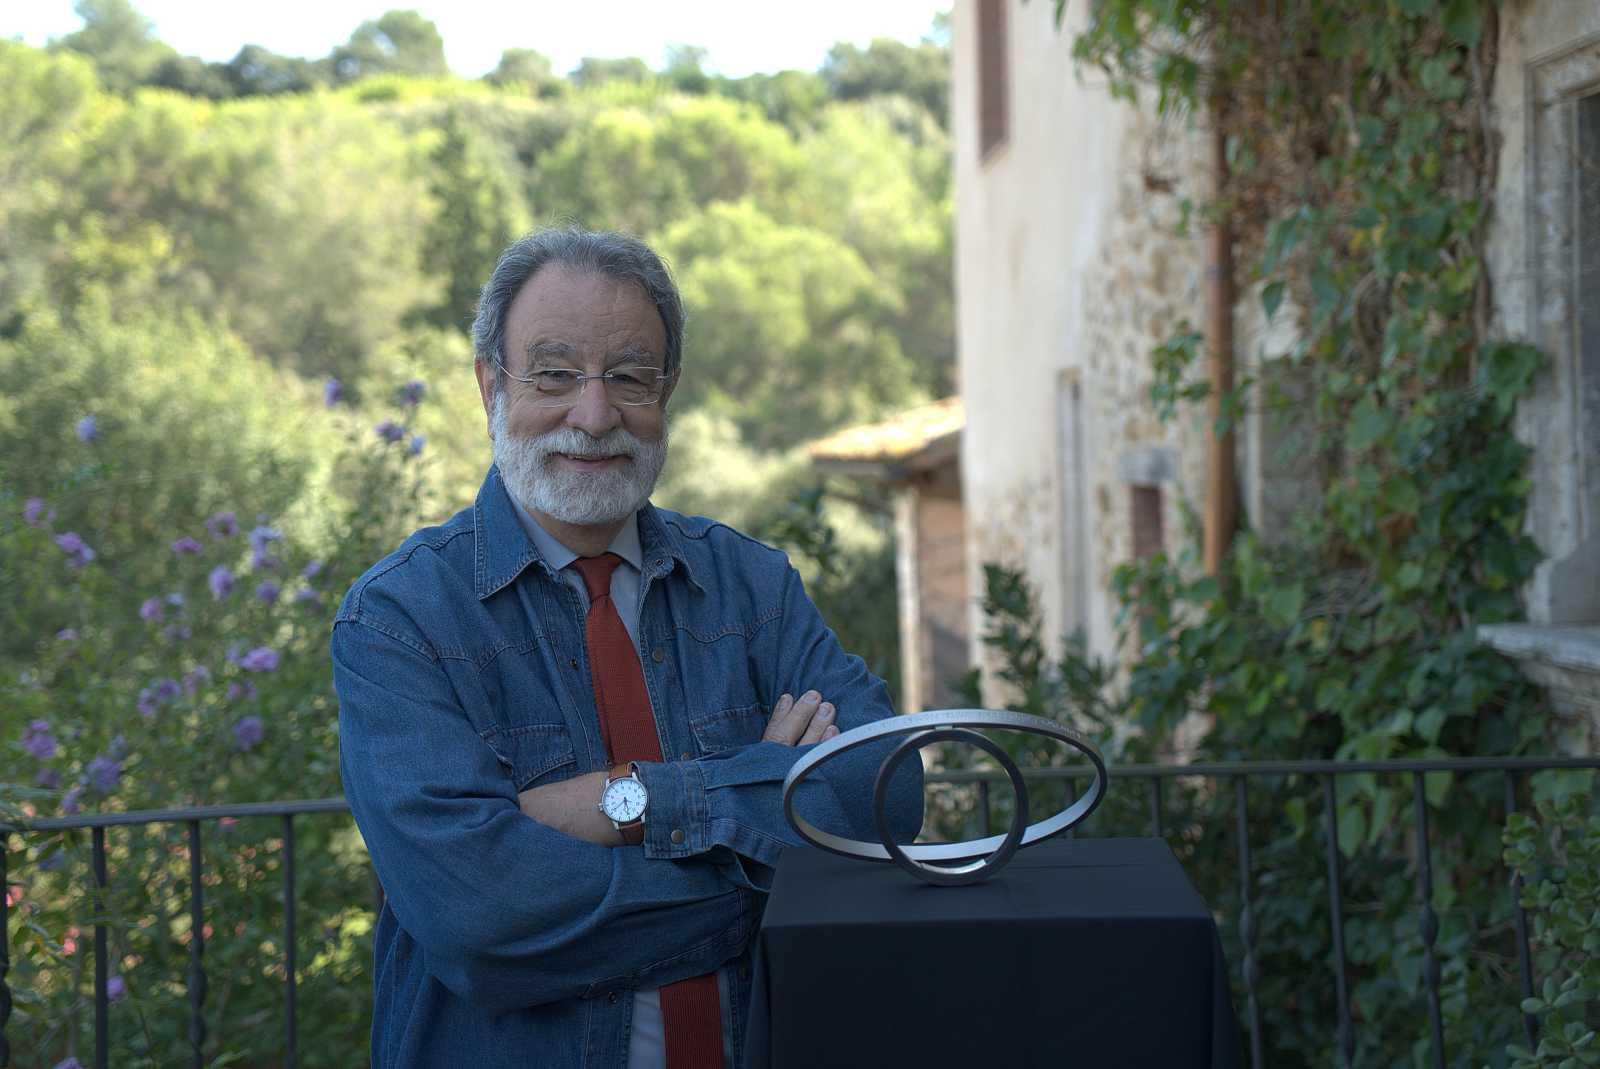 Reserva natural - El socioecólogo Ramón Folch, Premio Nat 2020 - 10/12/20 - Escuchar ahora